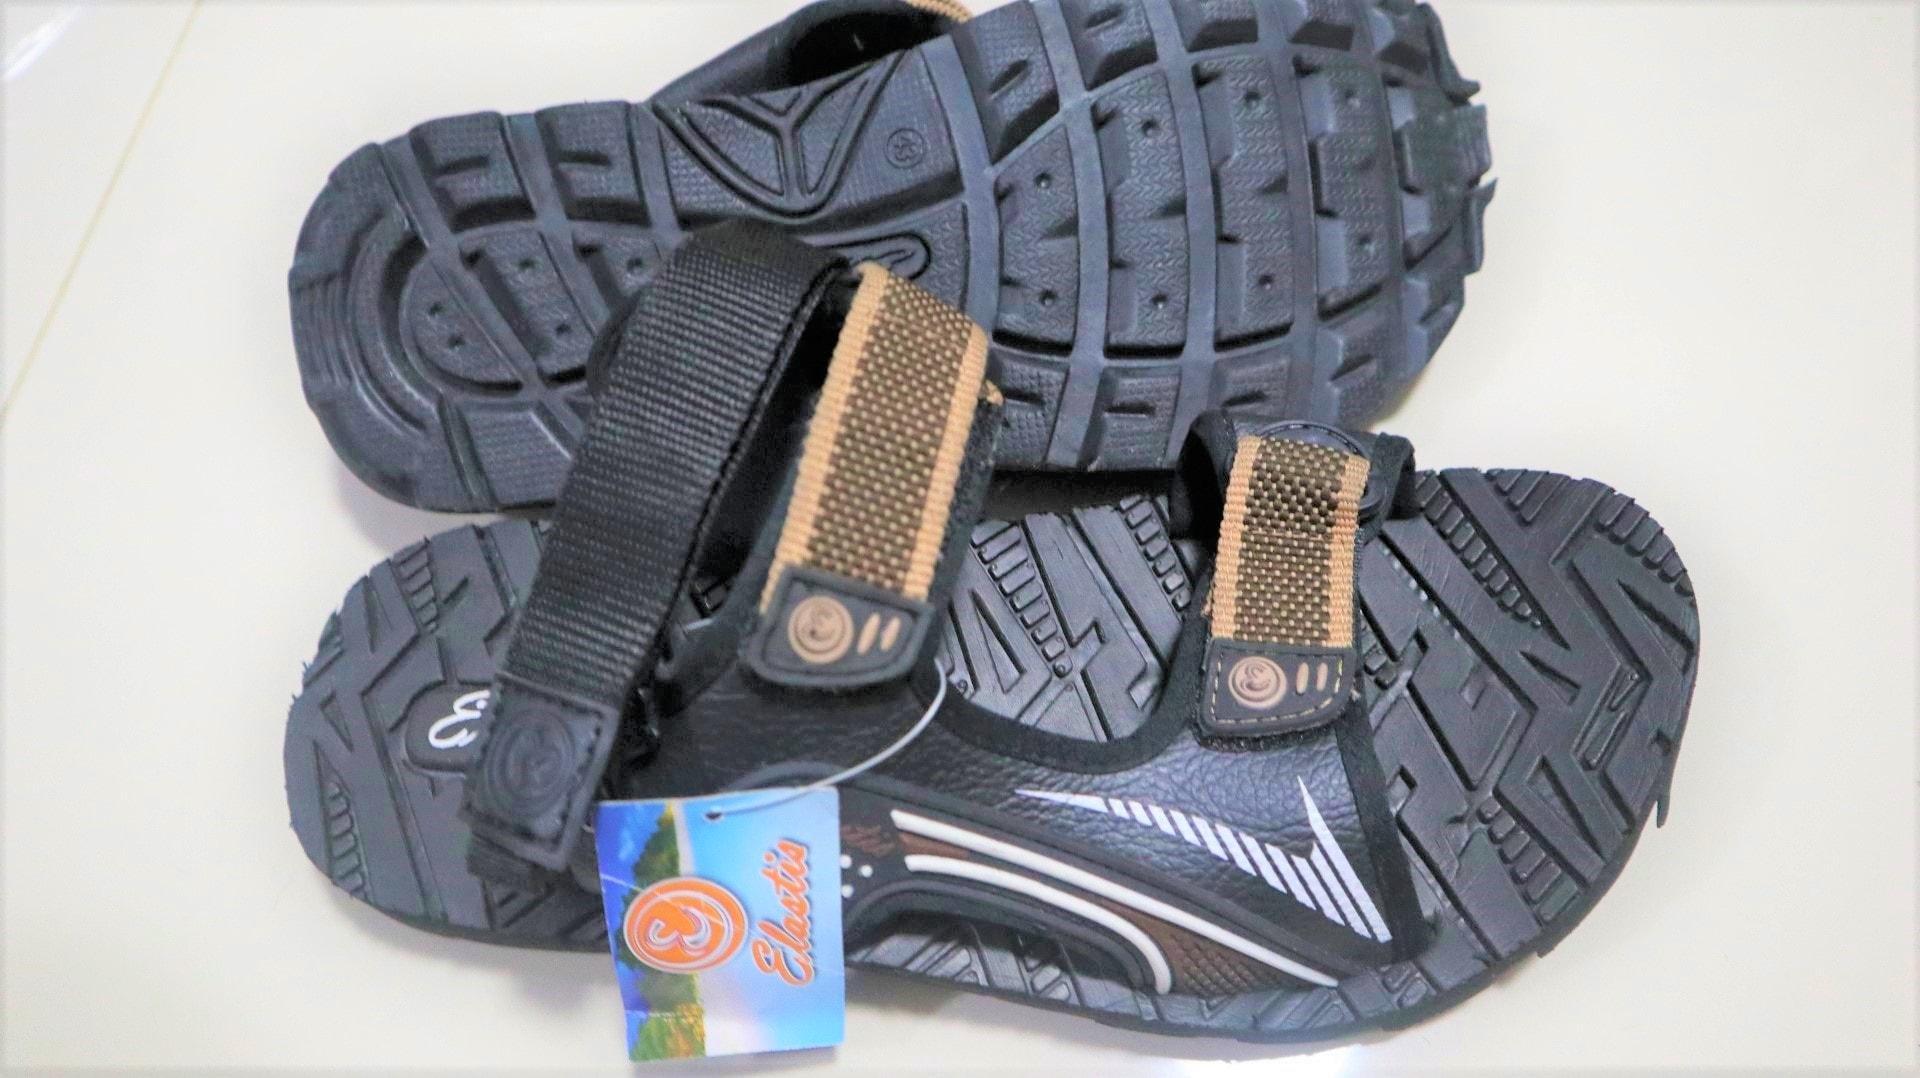 PROMO!! Sandal Gunung Elastis Sendal Jepit outdoor Ardiles Model eiger MS.02 - Cokelat Muda, 39 MURAH / DISKON